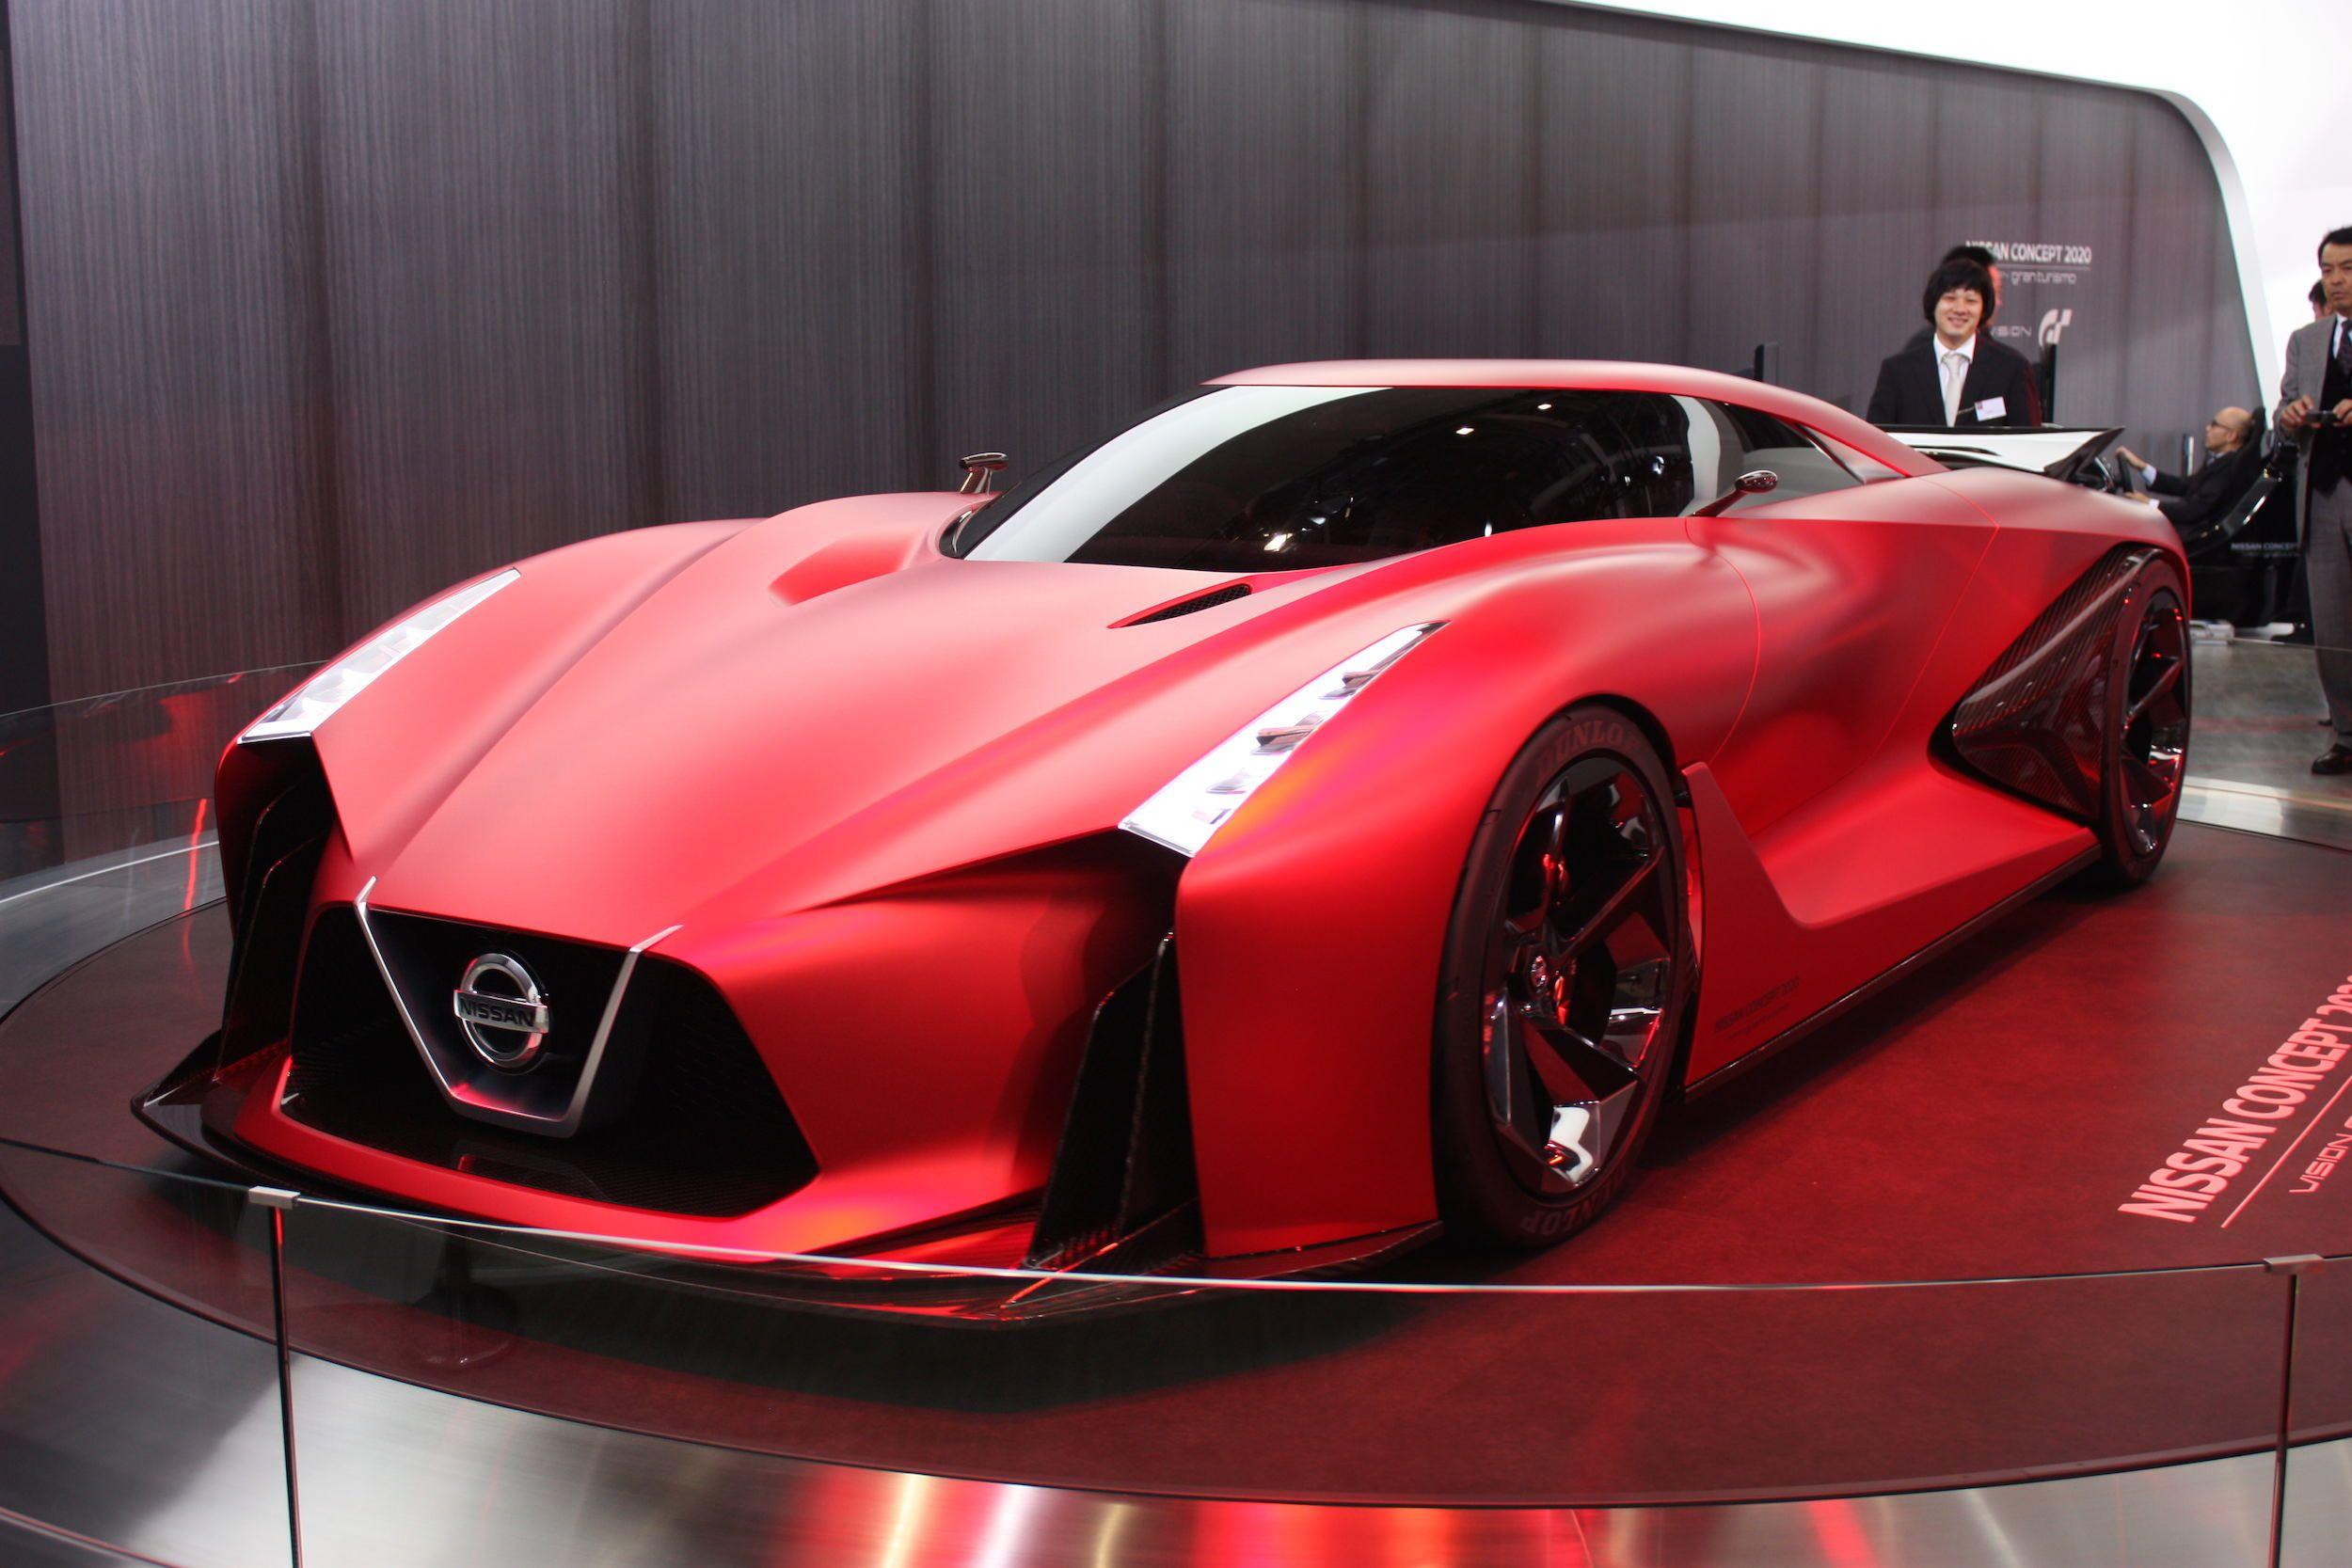 Tokyo Motor Show 2015 Nissan Concept 2020 Vision Gt Sssupersports Com Tokyo Motor Show Nissan Nissan Gt